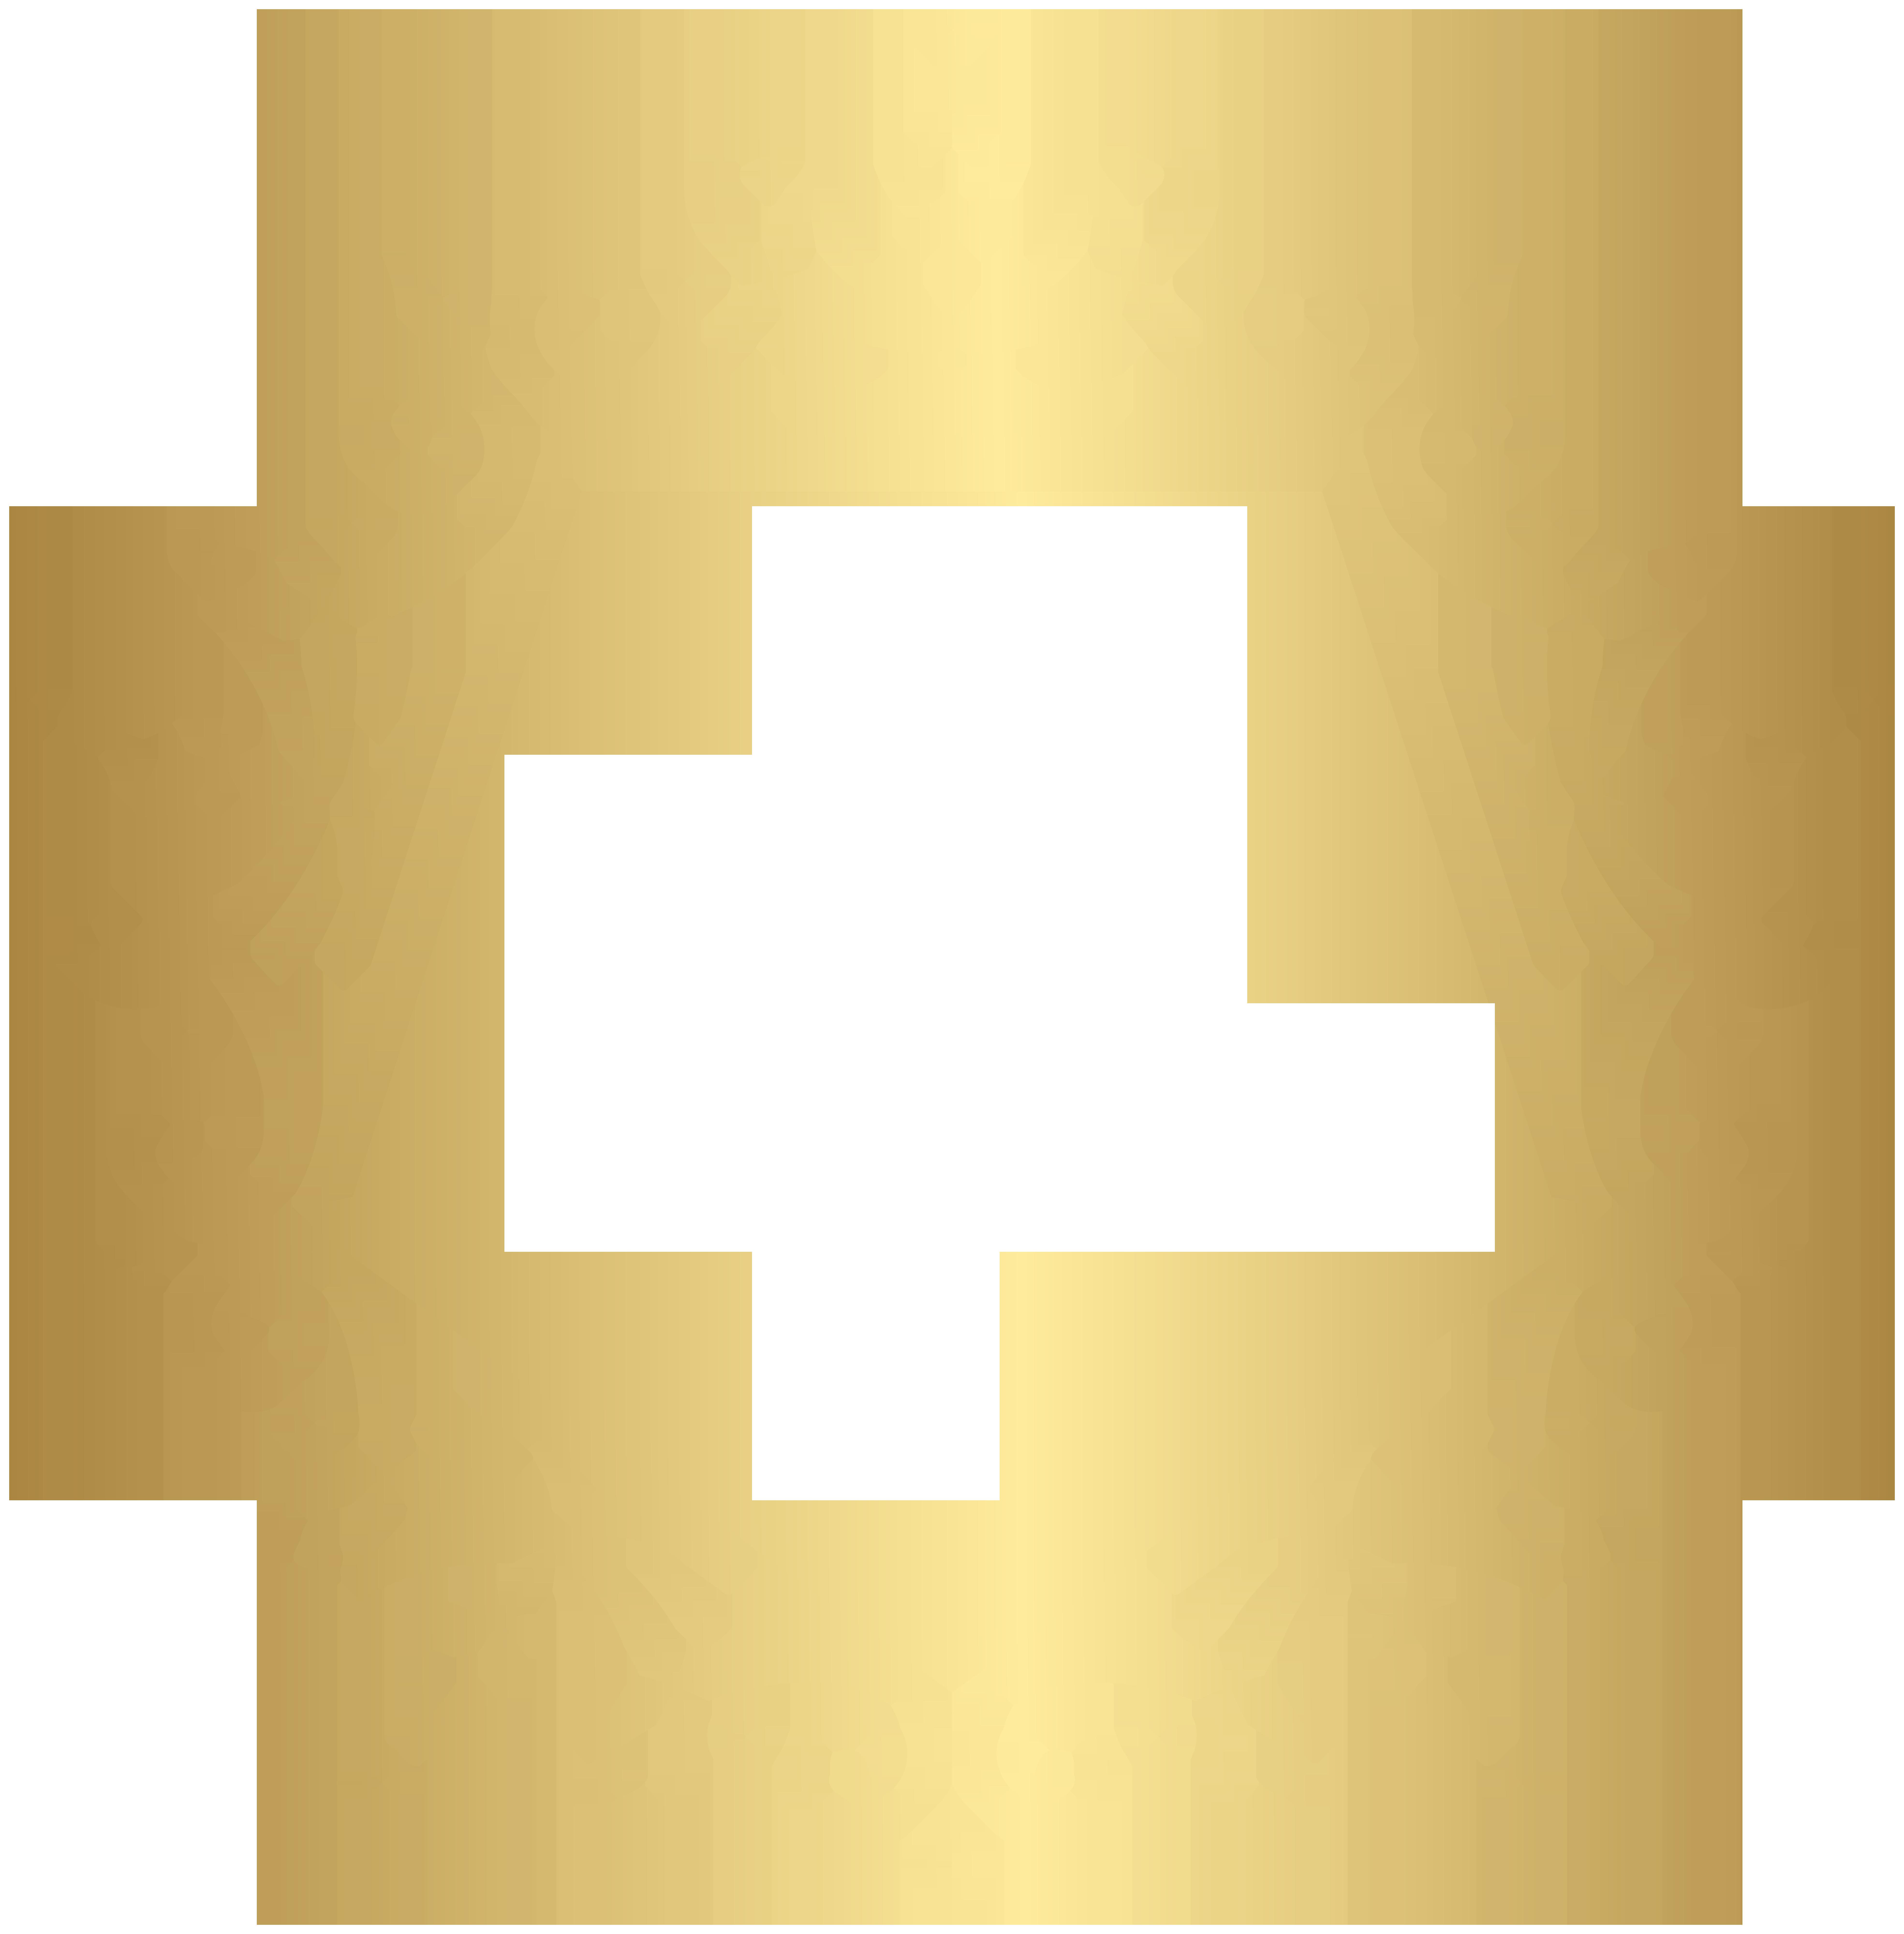 Circular Decorative Border PNG Clip Art Image.